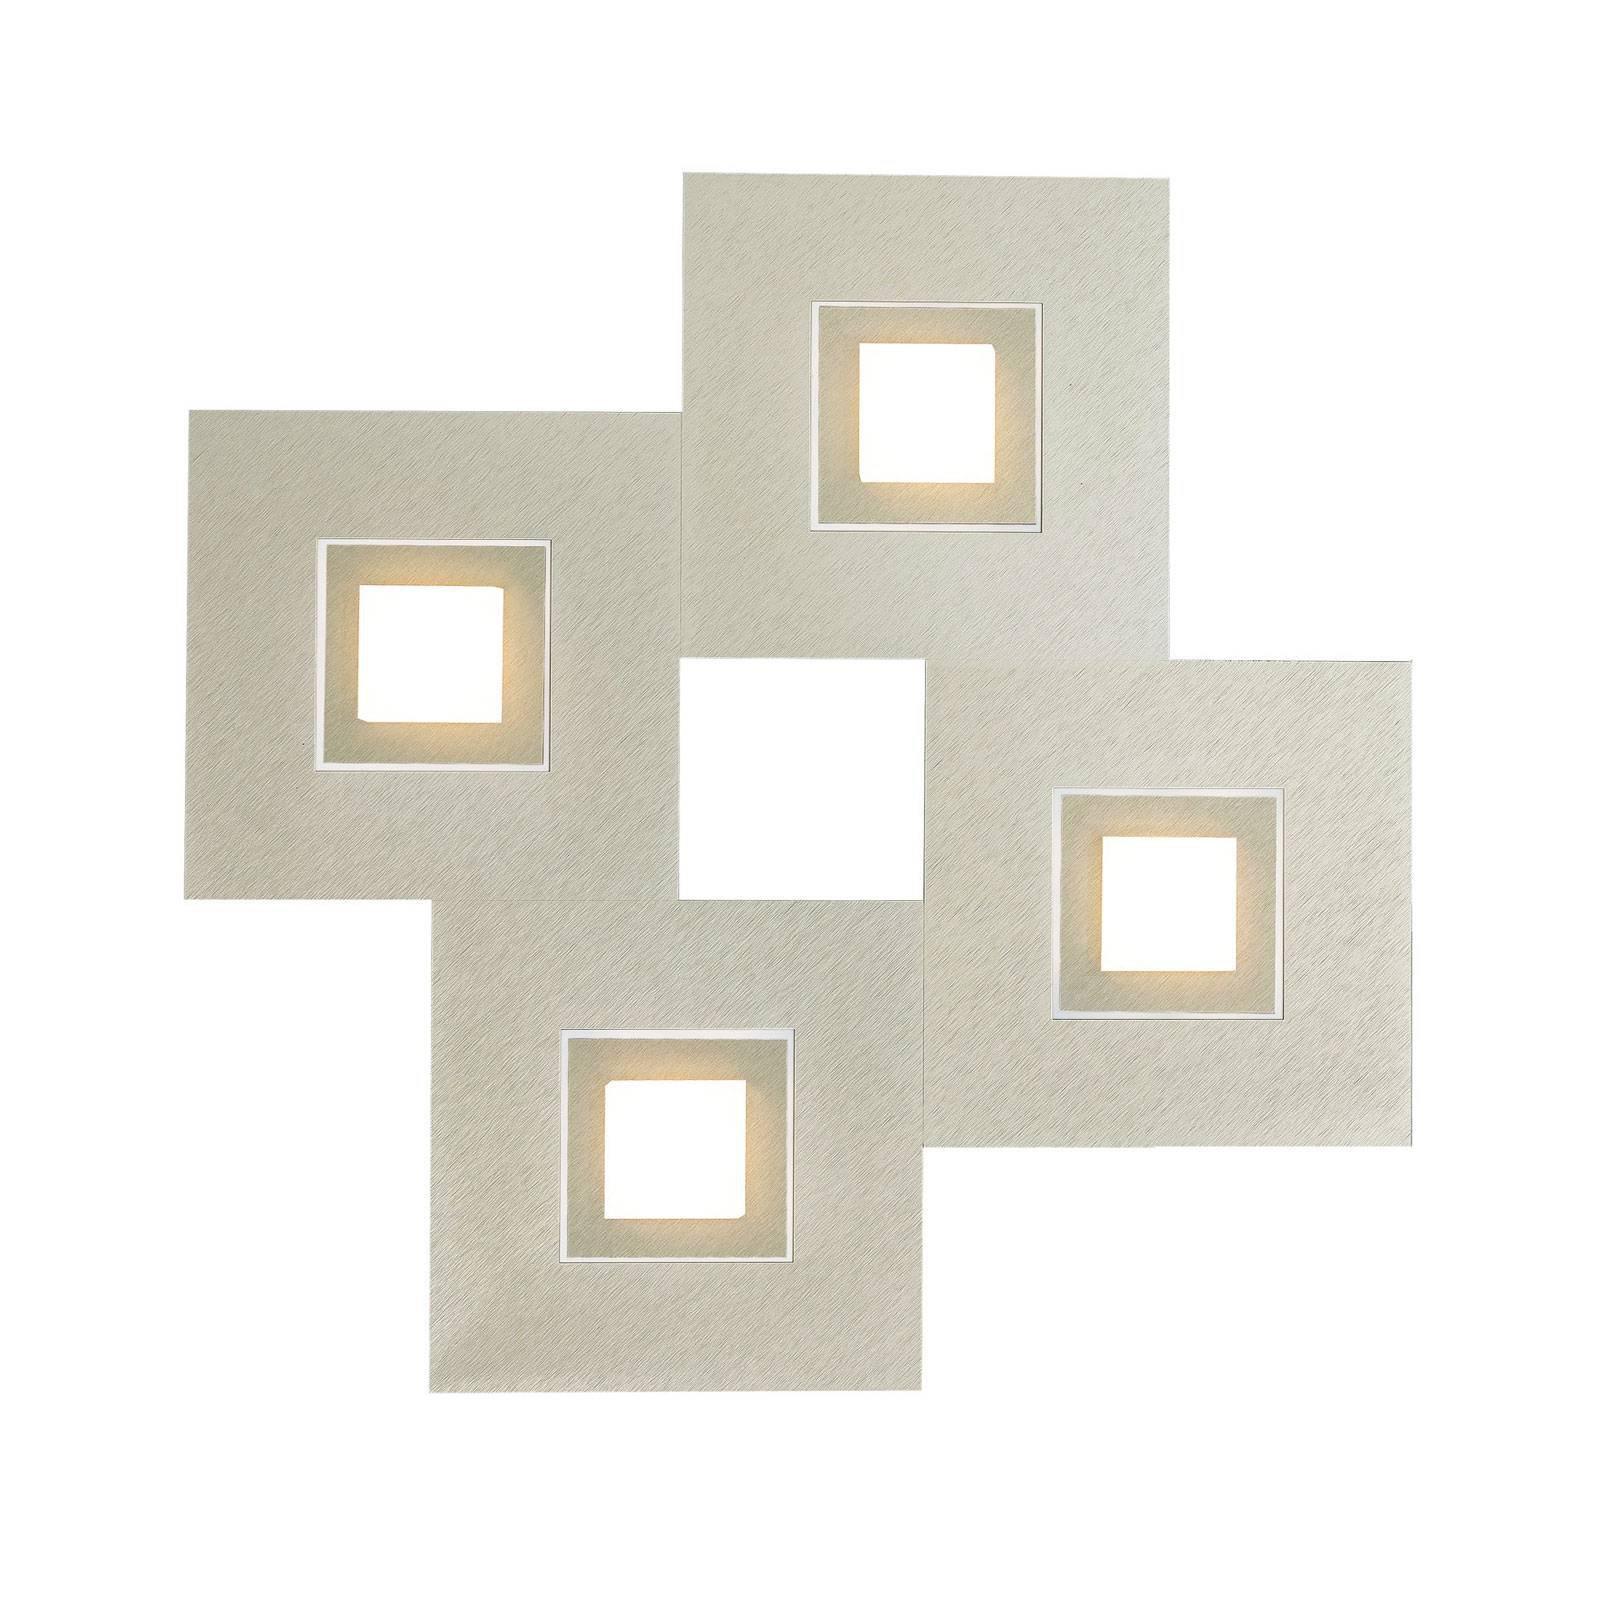 GROSSMANN Karree, 4 lysk., 50x50, perlemor, titan